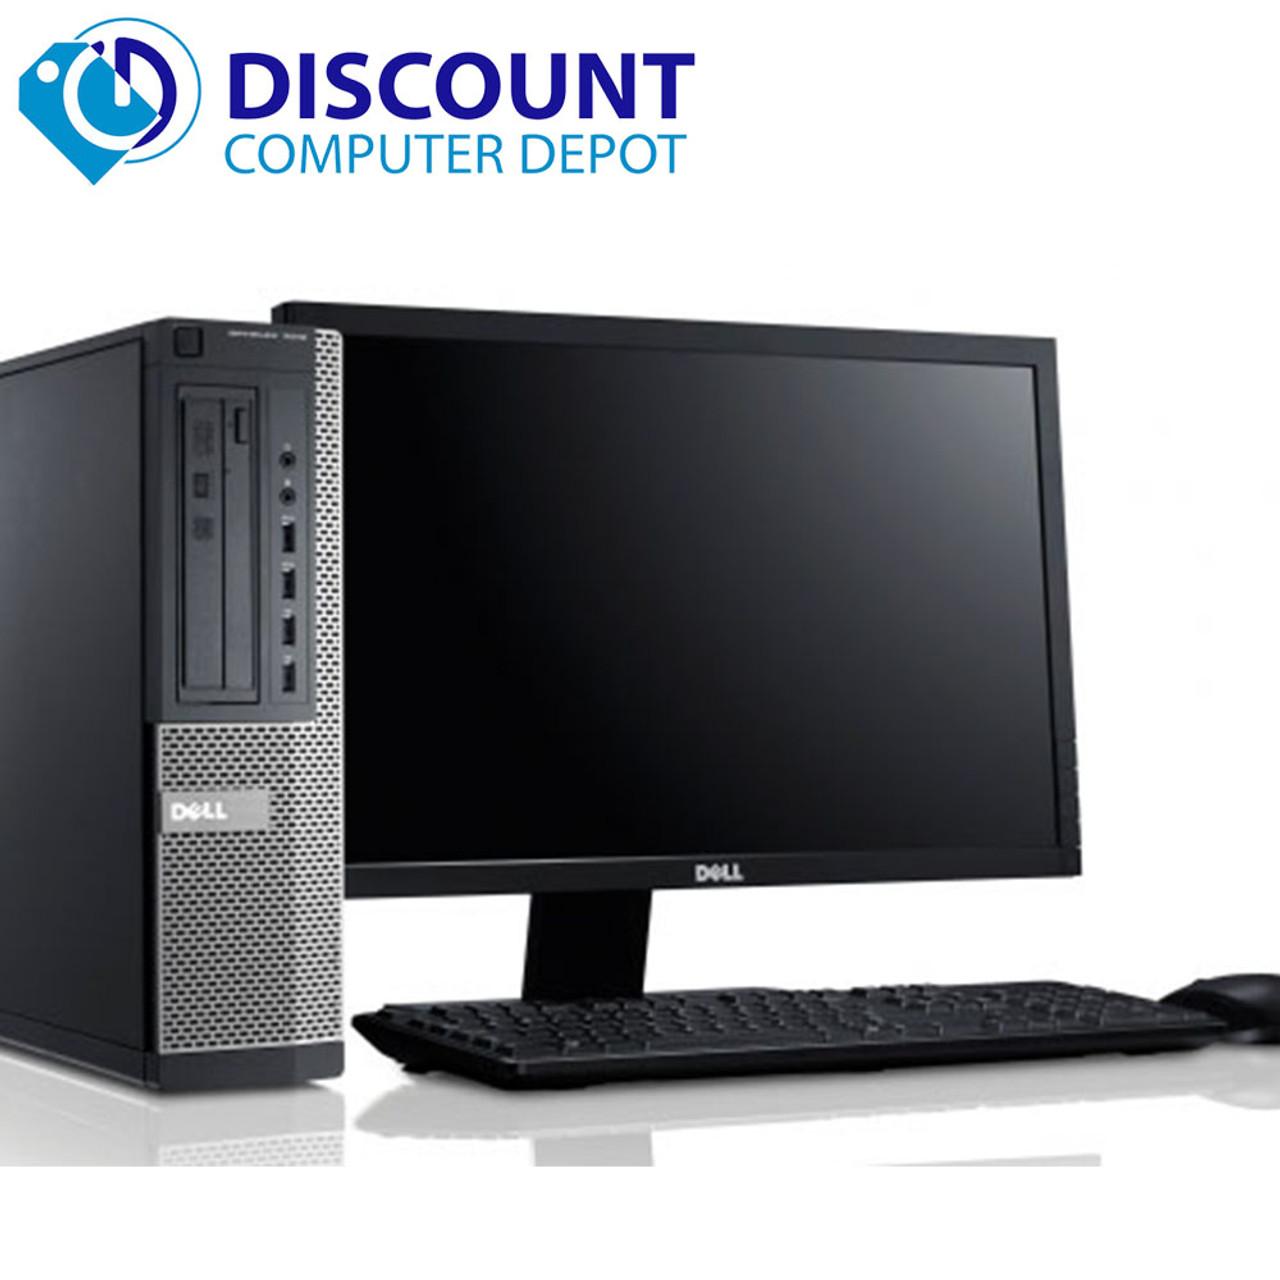 Dell Optiplex 3010 Desktop Quad Core I5-3470 3 2GHz 4GB 500GB DVD-RW  Windows 10 w/22